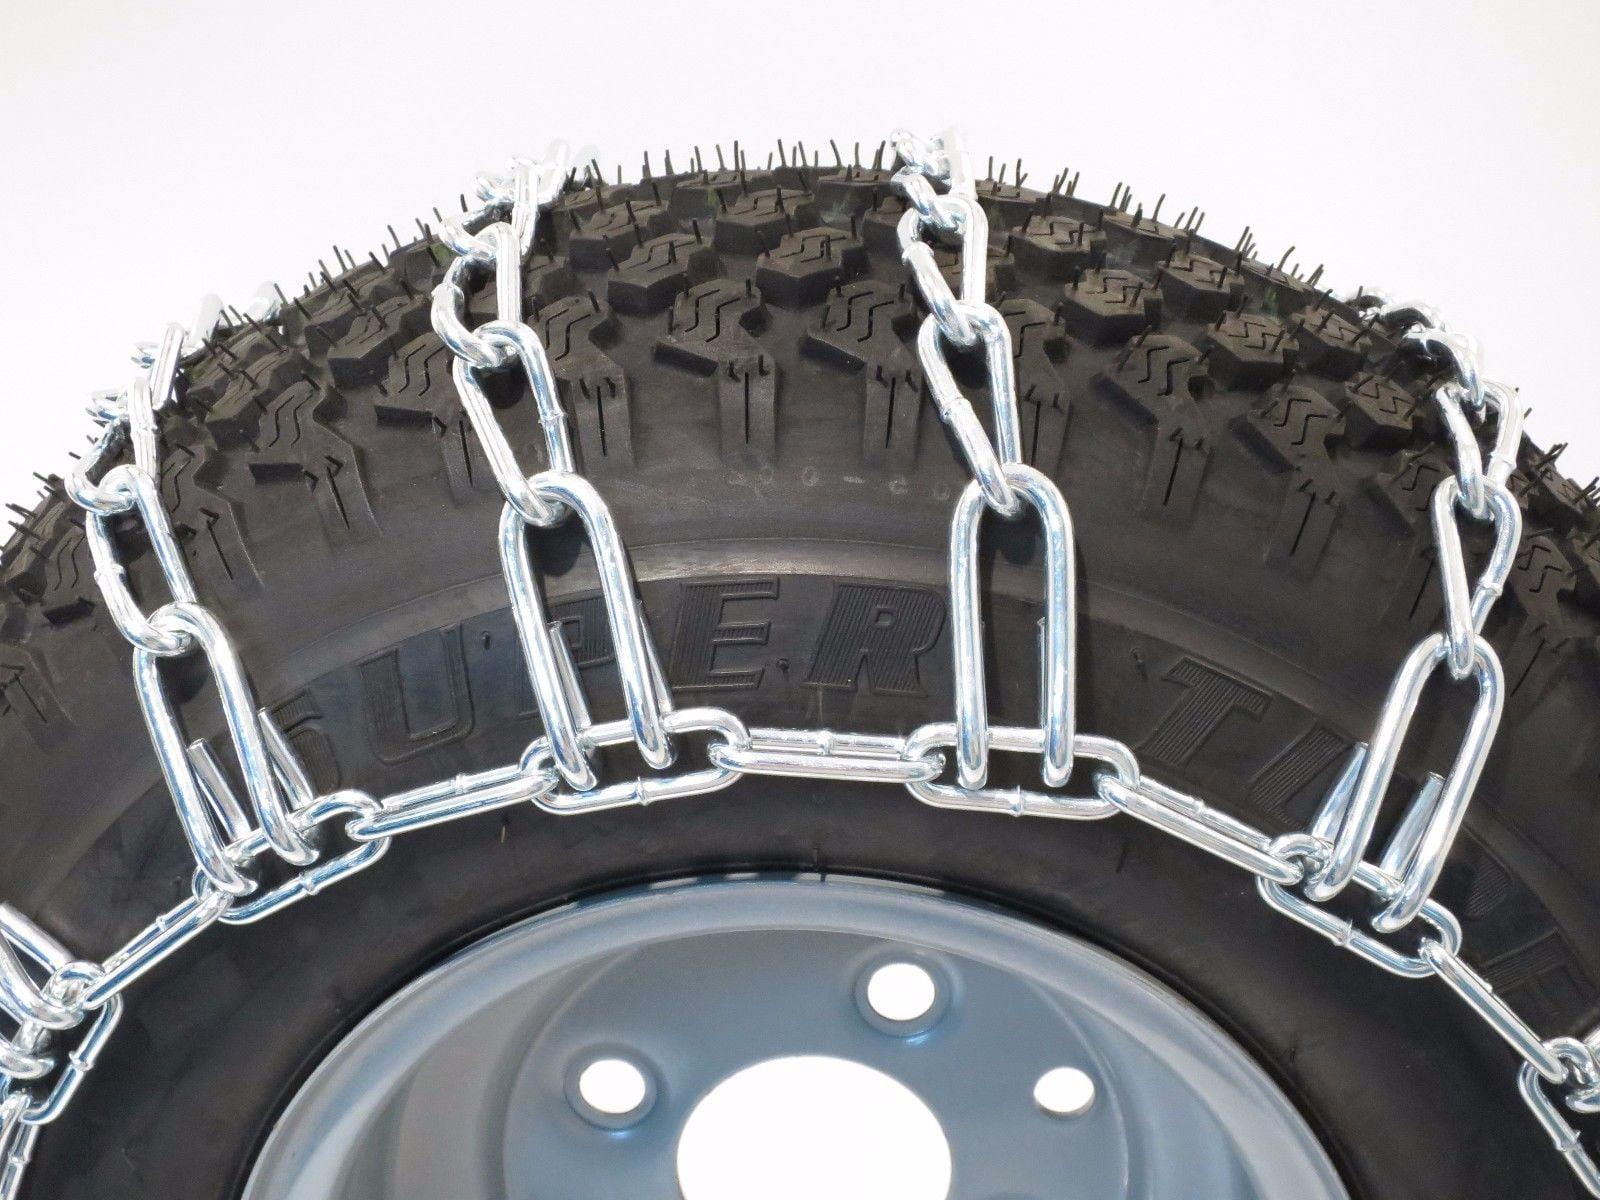 PAIR 2 Link TIRE CHAINS 16x6.5x8 16x6.5x6 for UTV ATV Vehicle Peerless MaxTrac